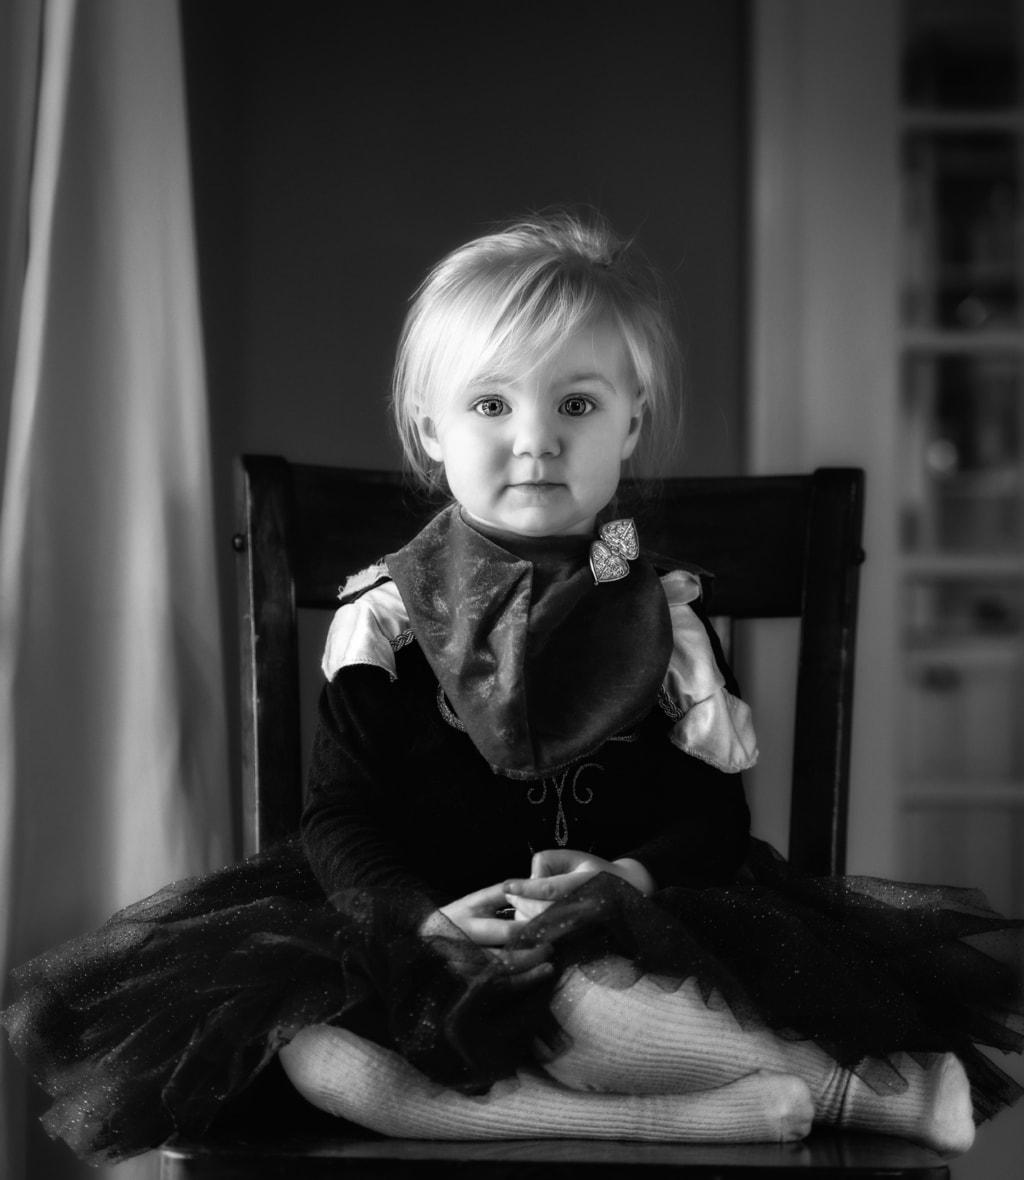 Bella via LimebluPhotography